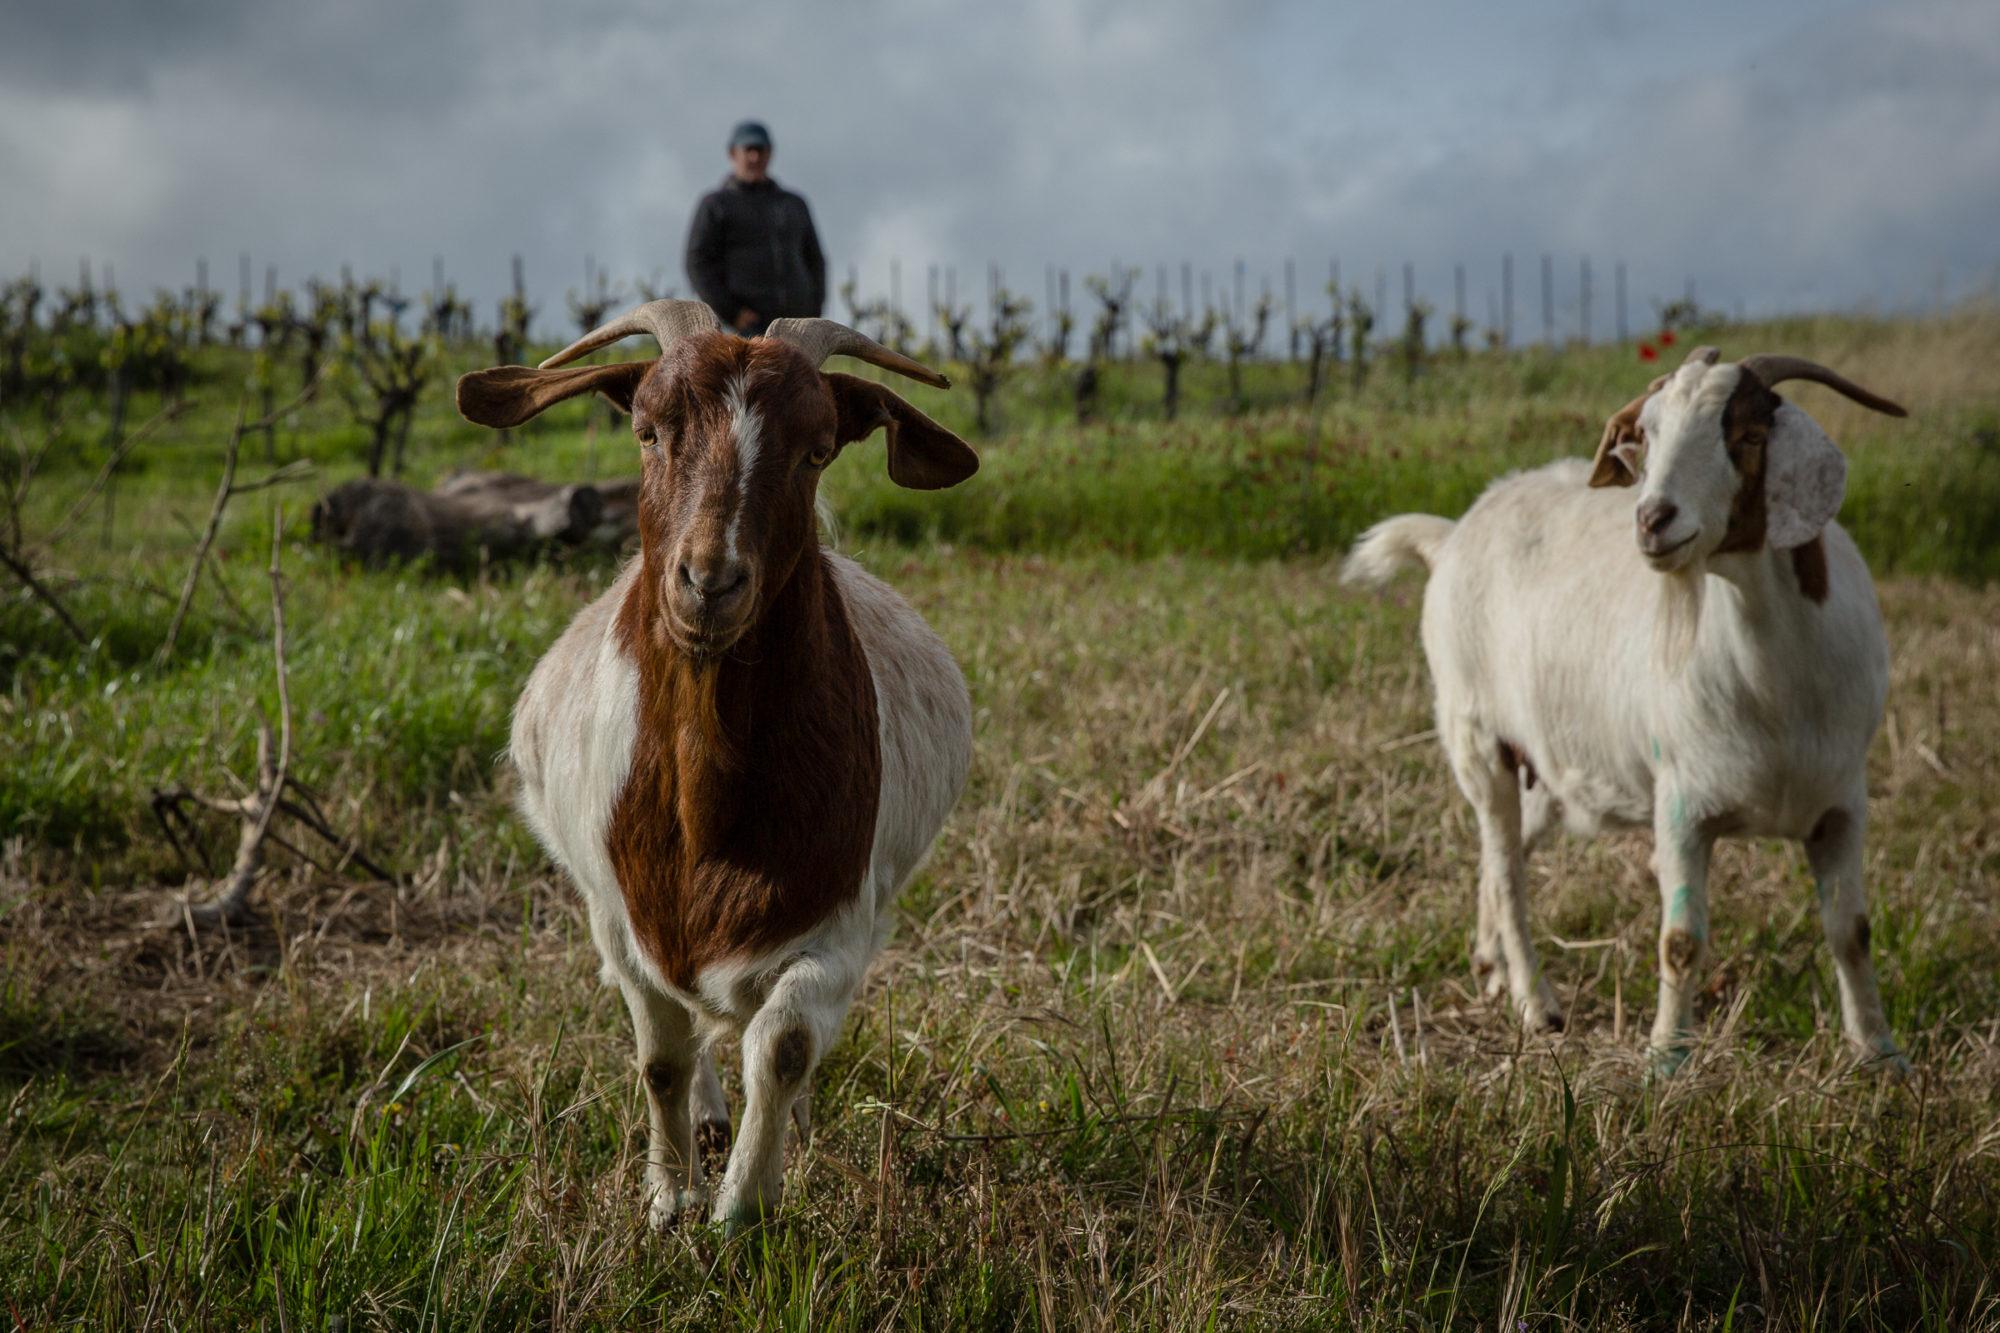 goats roaming the vineyard